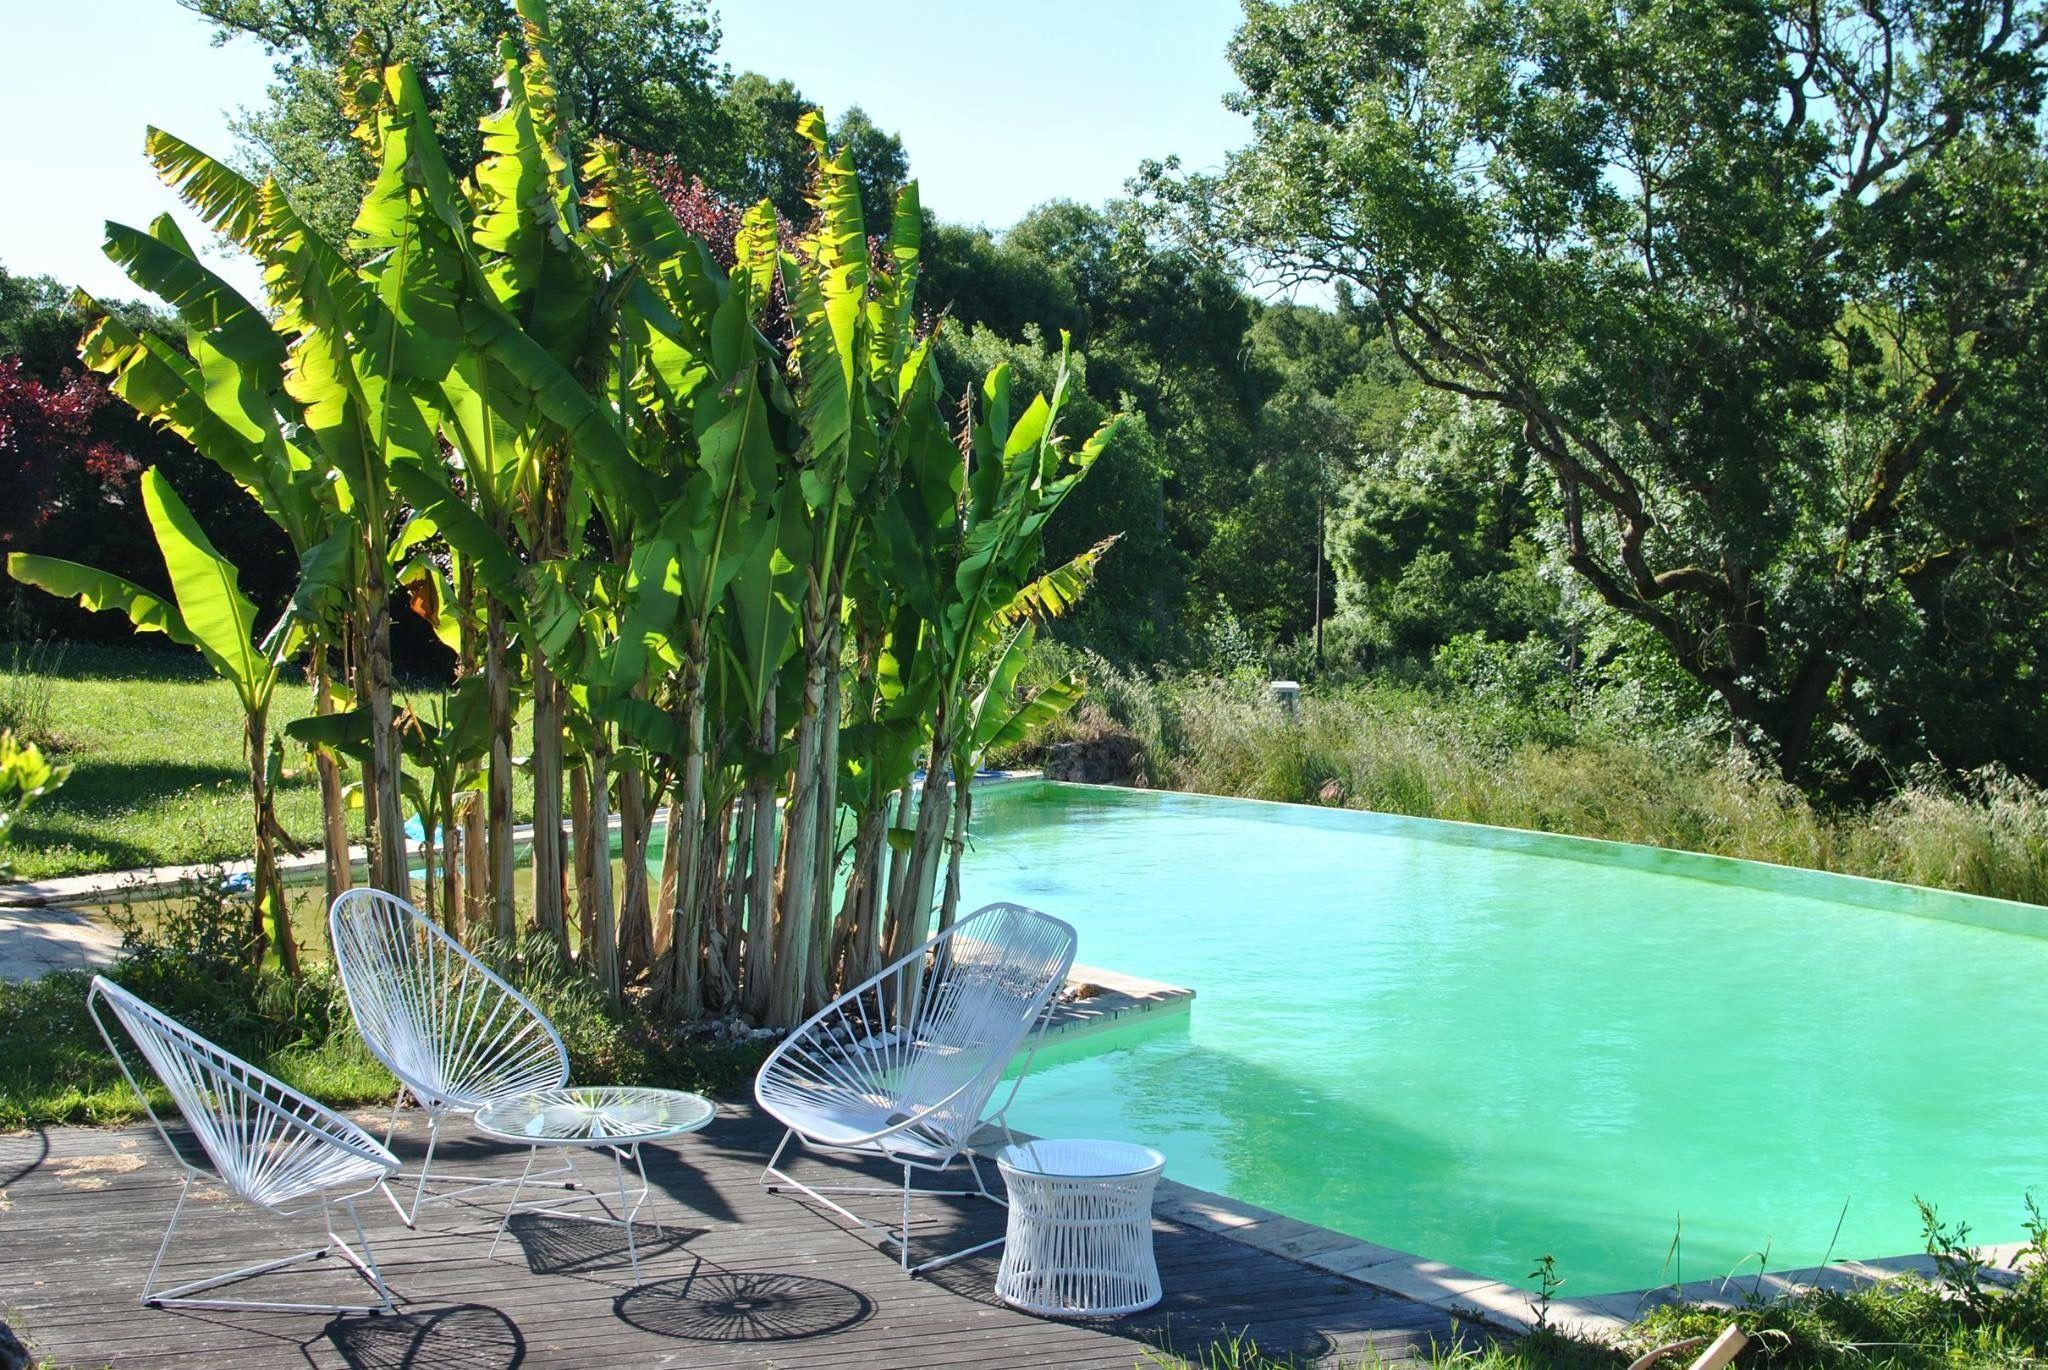 boqa #acapulco #fauteuil #chair #decoration #design #swimmingpool ...